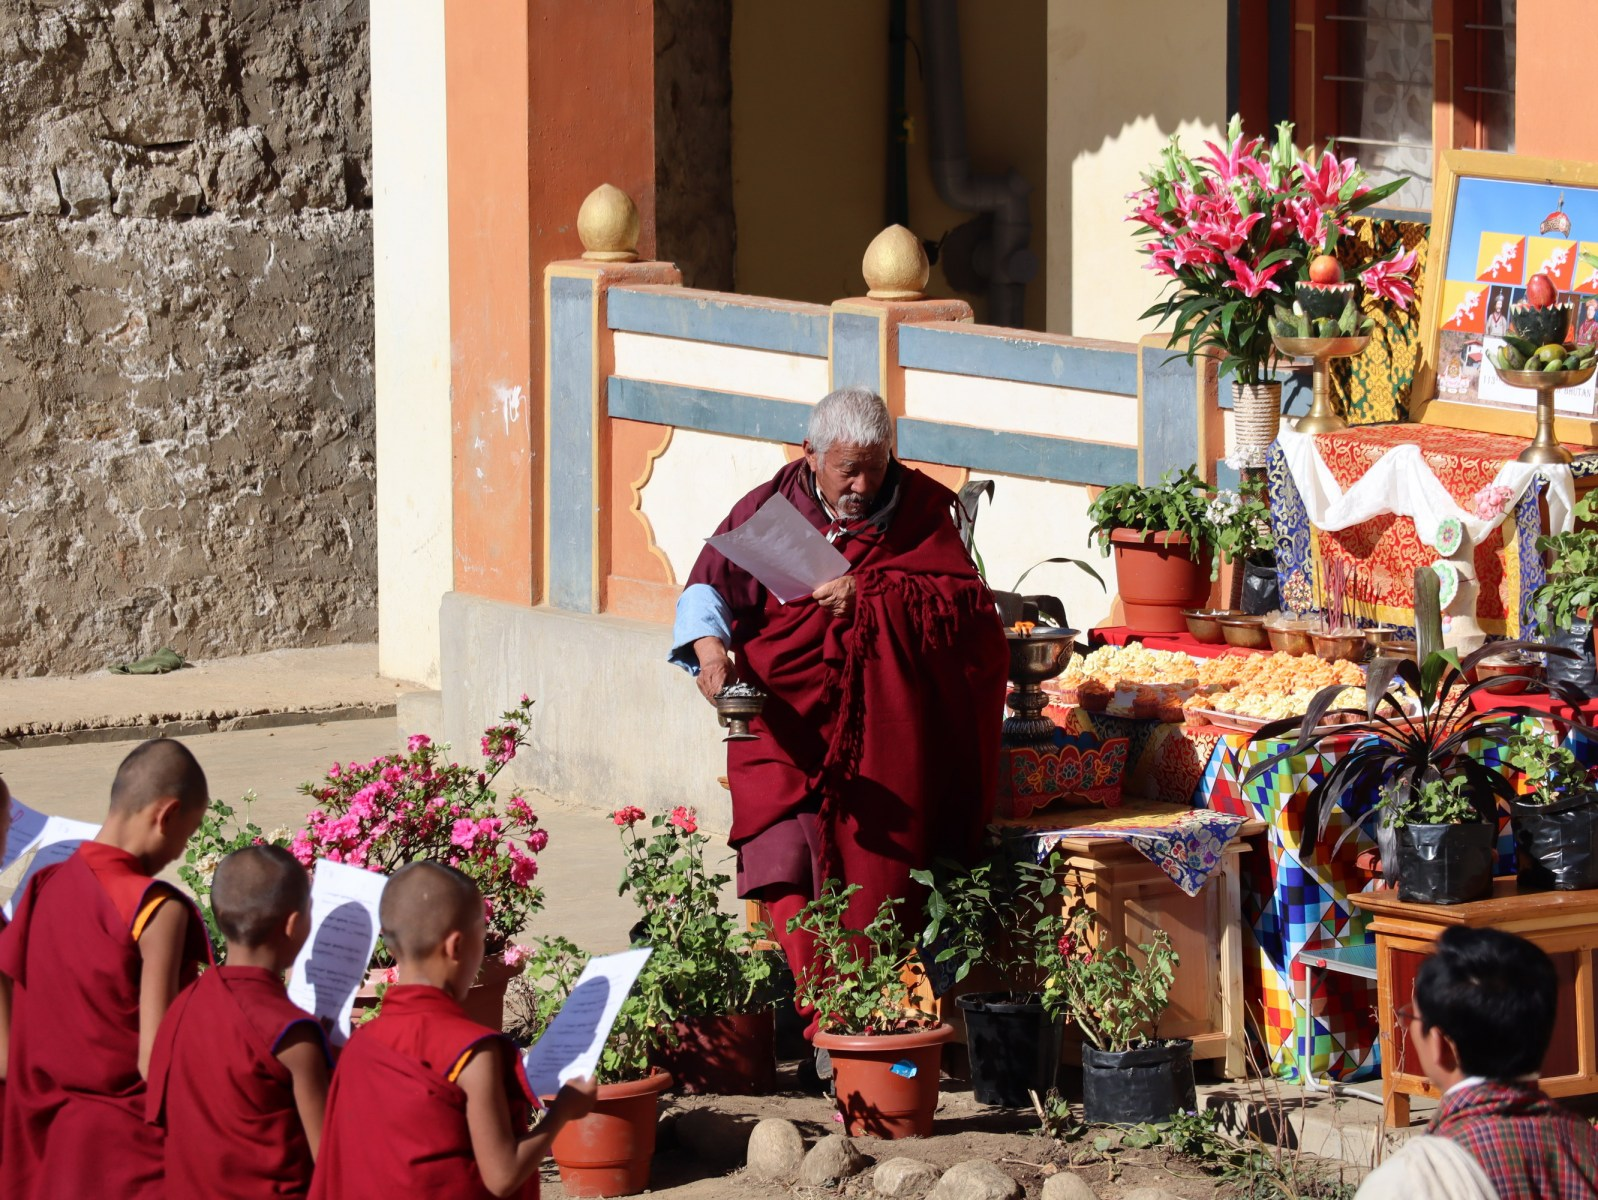 113-National-day-of-Bhutan-33